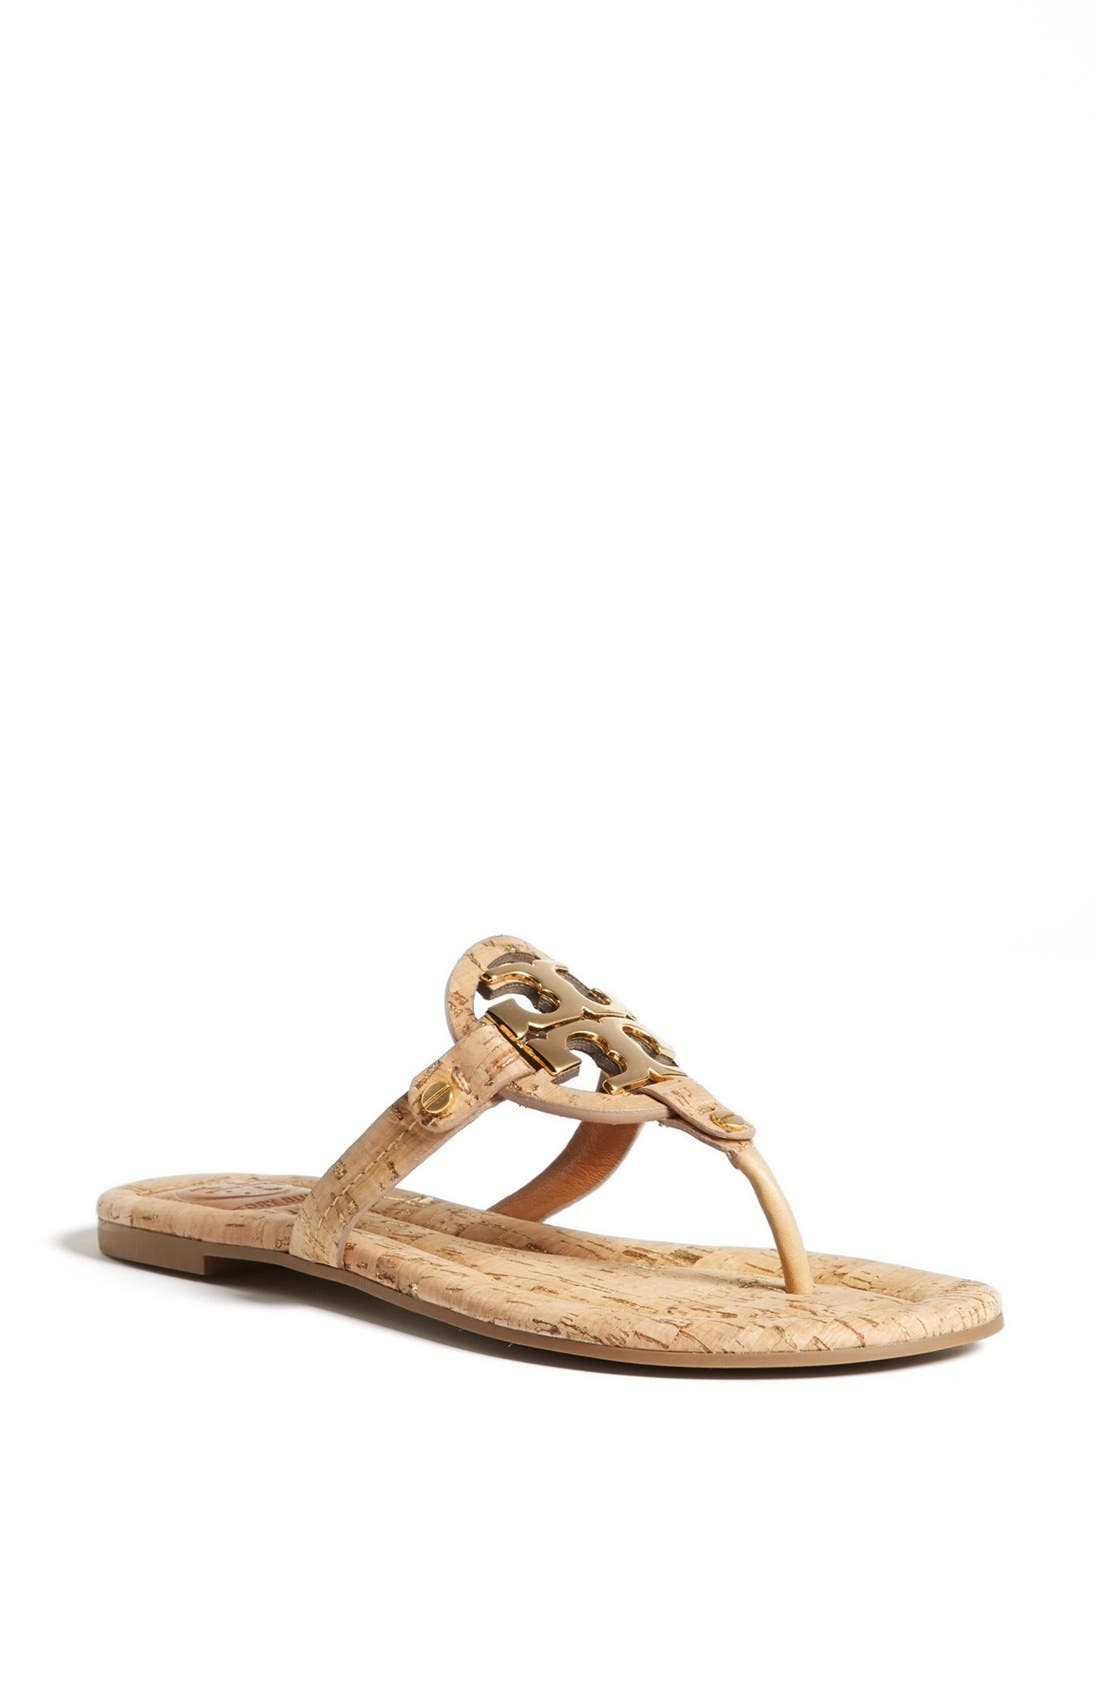 Alternate Image 1 Selected - Tory Burch 'Miller 2' Sandal